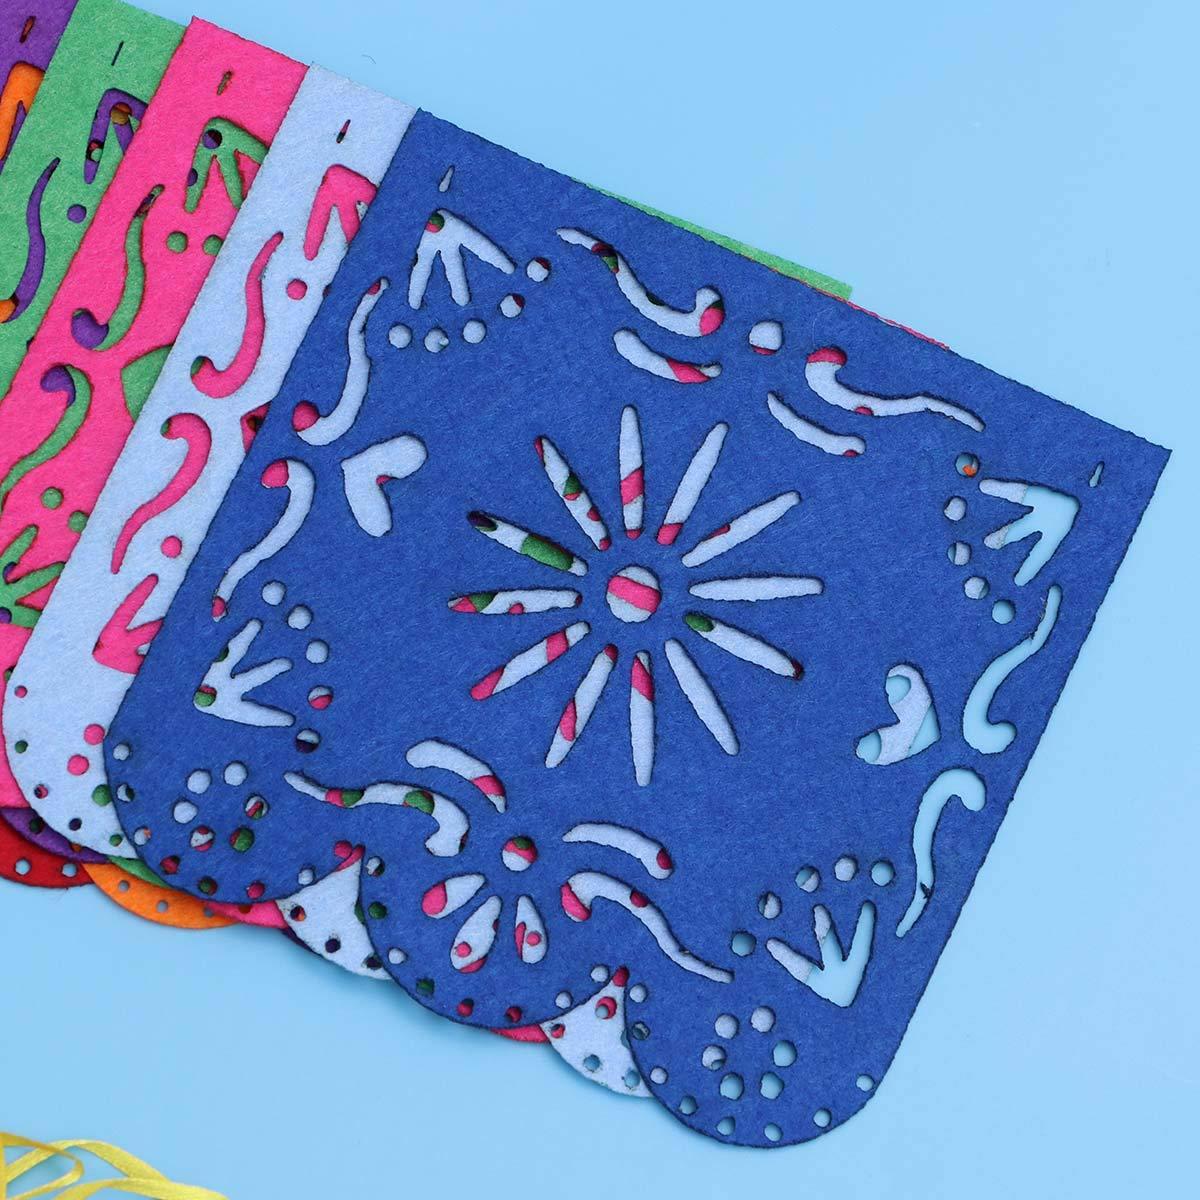 Vosarea Papel Picado Banner Square Fieltro Vibrante Paneles de Flores Papel de Seda para cumplea/ños Fiesta de Bodas